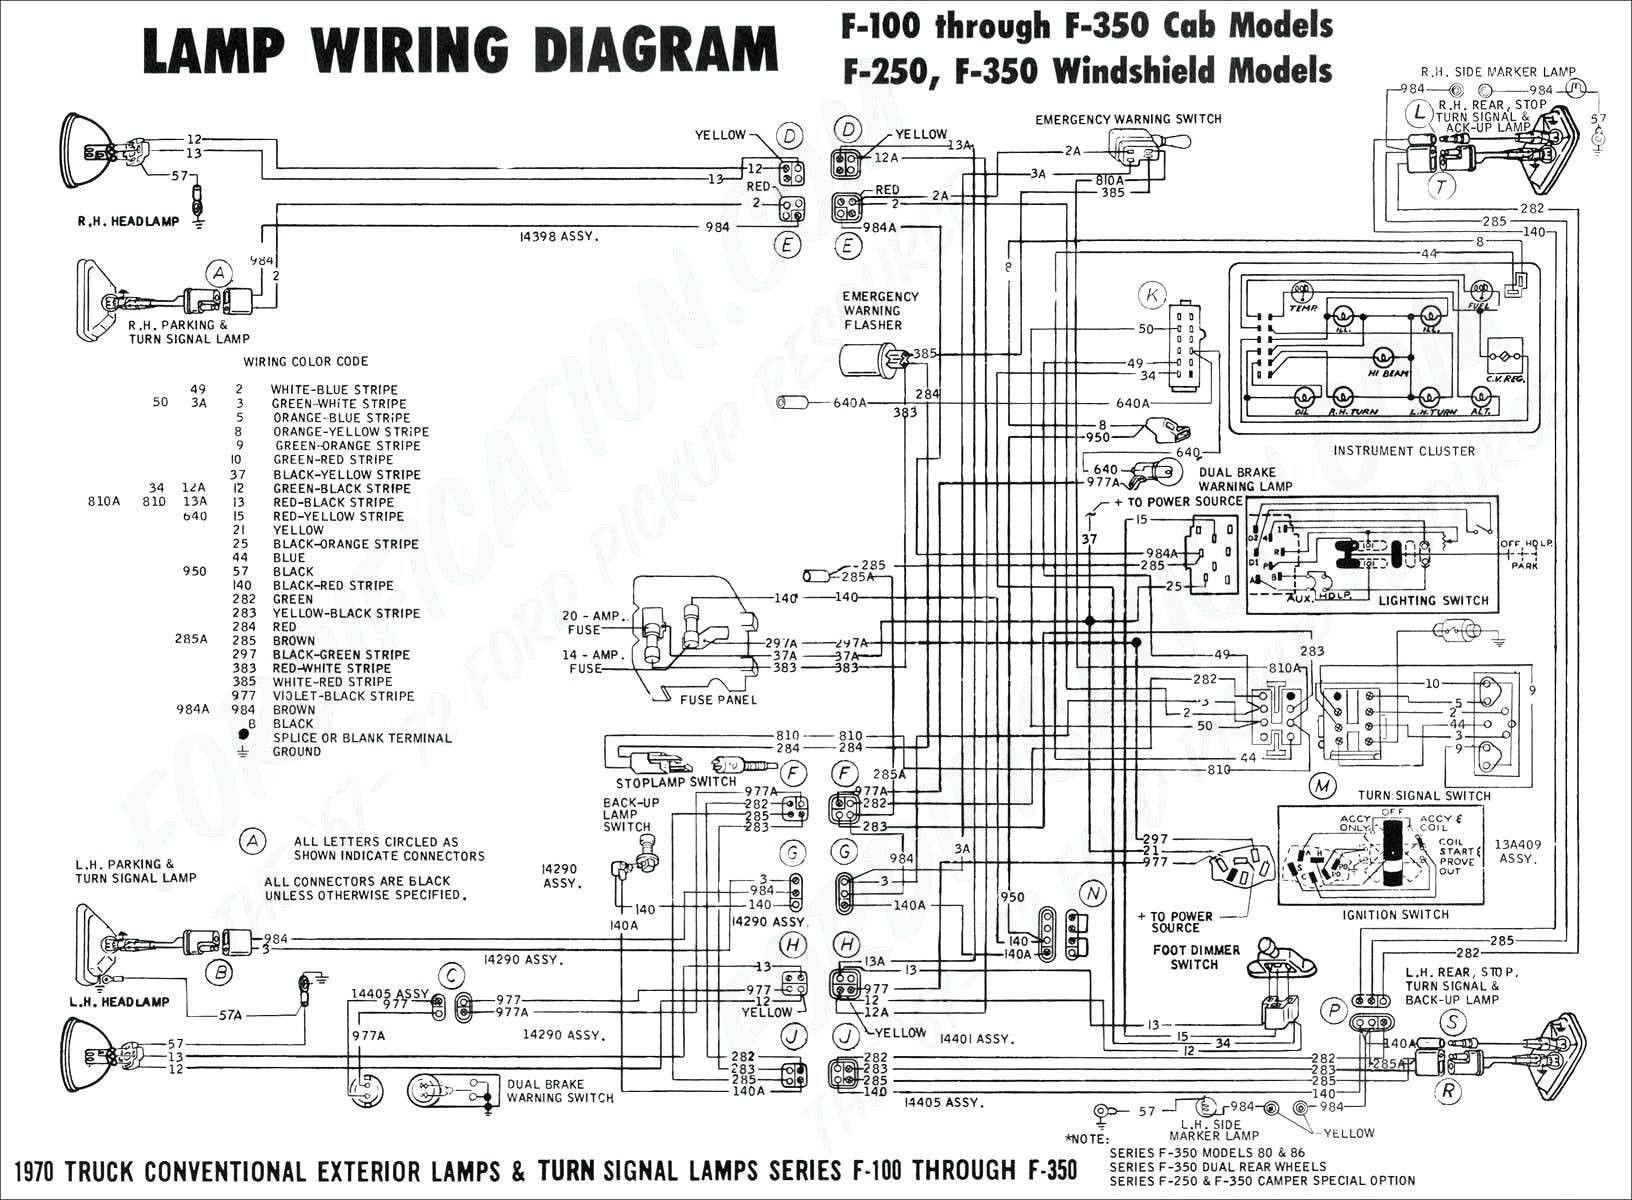 Ford Alternator Wiring Diagrams Unique Volkswagen Generator Wiring Diagram Diagram Of Ford Alternator Wiring Diagrams